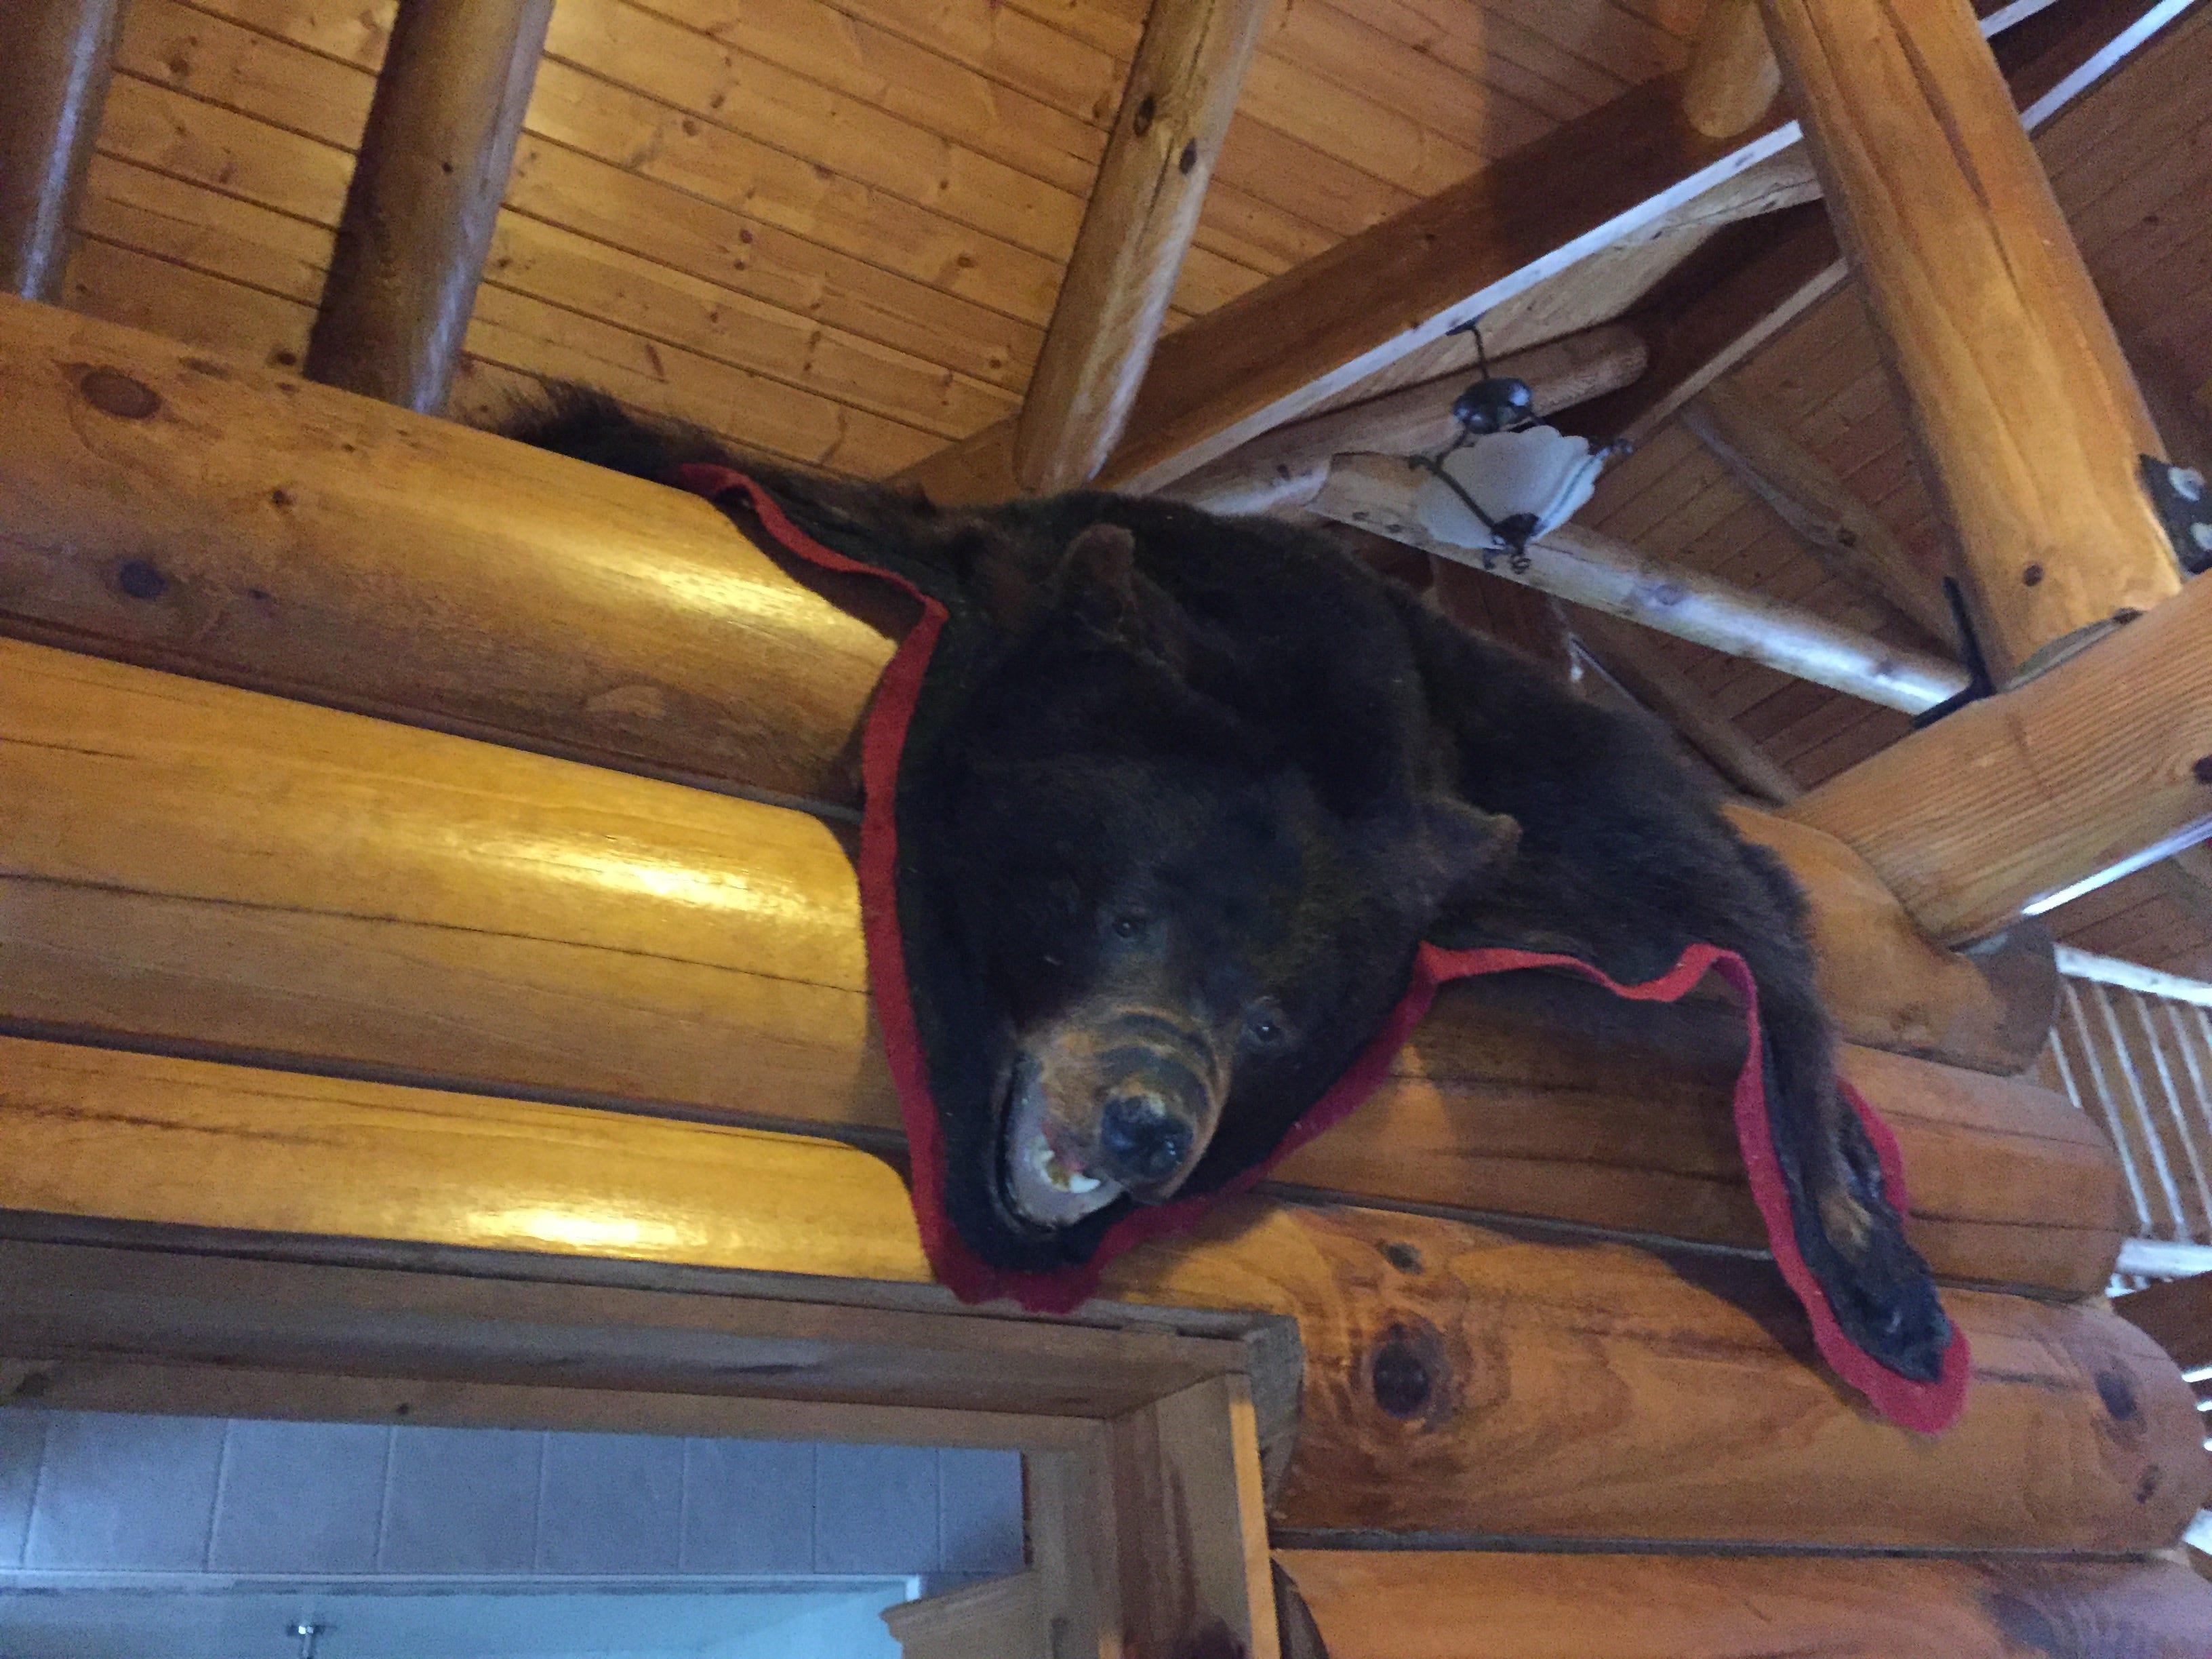 A bear skin rug hangs over the edge of a loft off the staircase inside a Hartland Township log cabin home, shown Wednesday, Nov. 21, 2018.